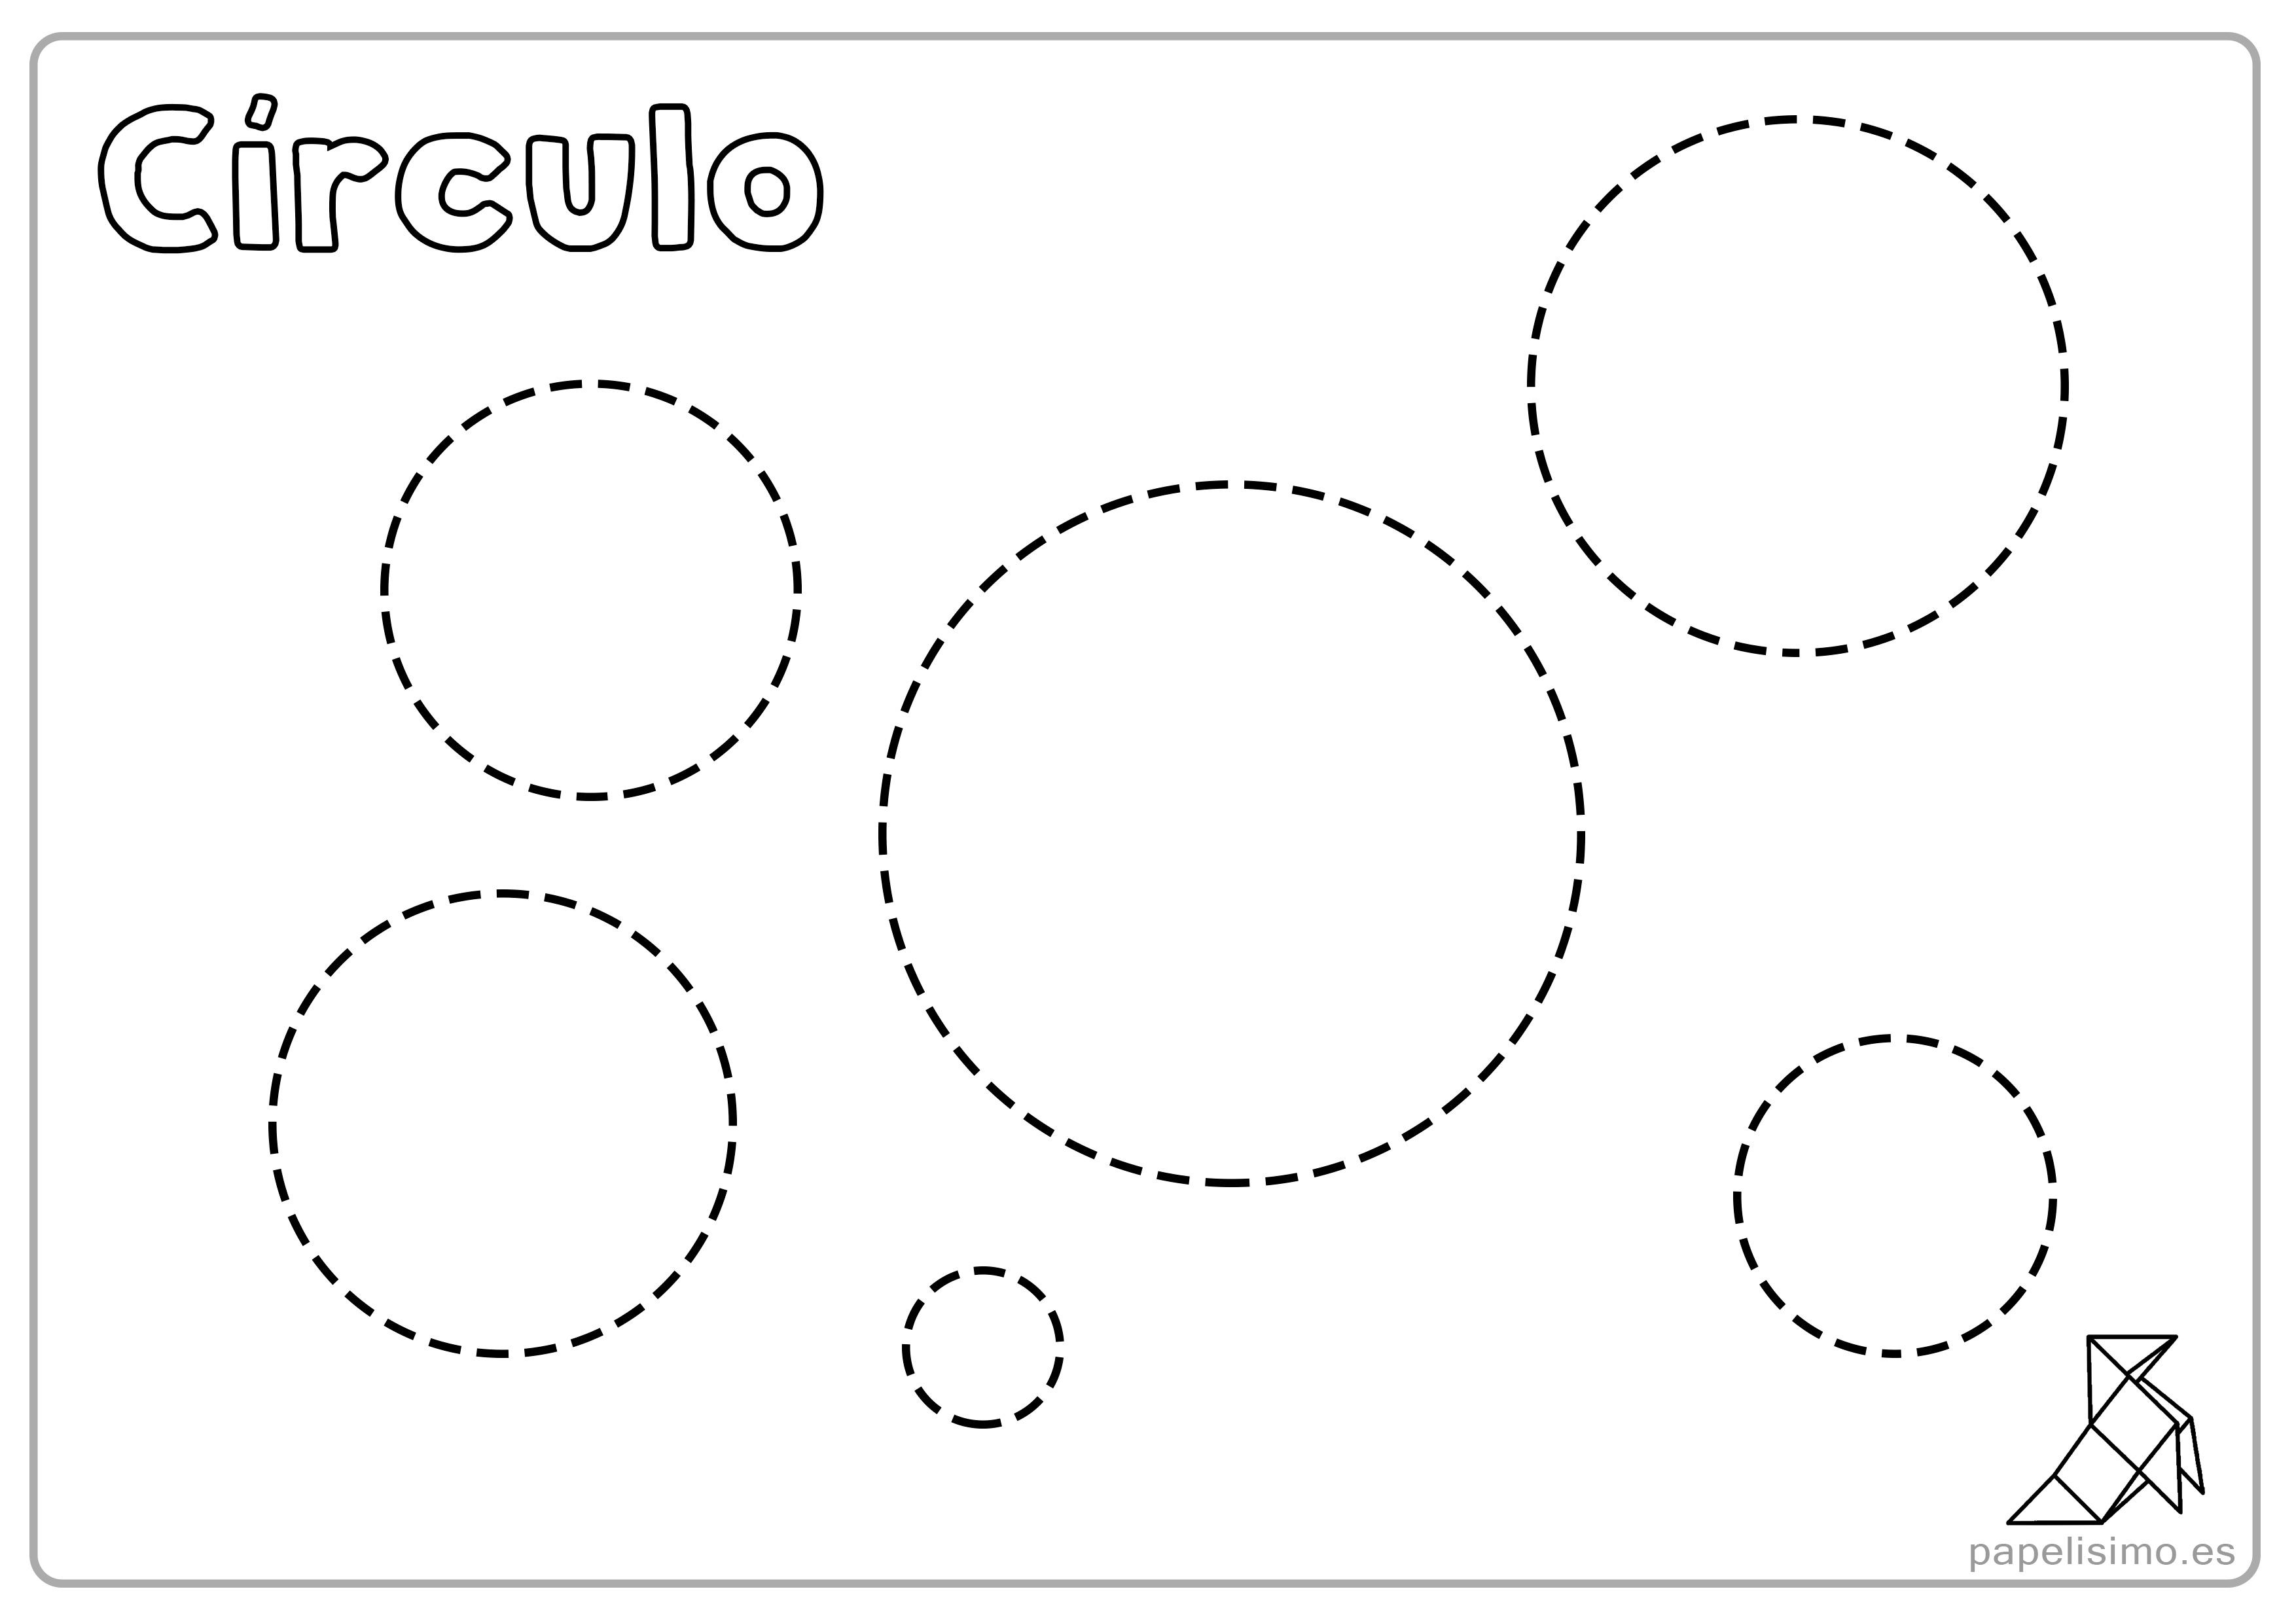 Fichas De Figuras Geometricas Para Imprimir Para Ninos Papelisimo